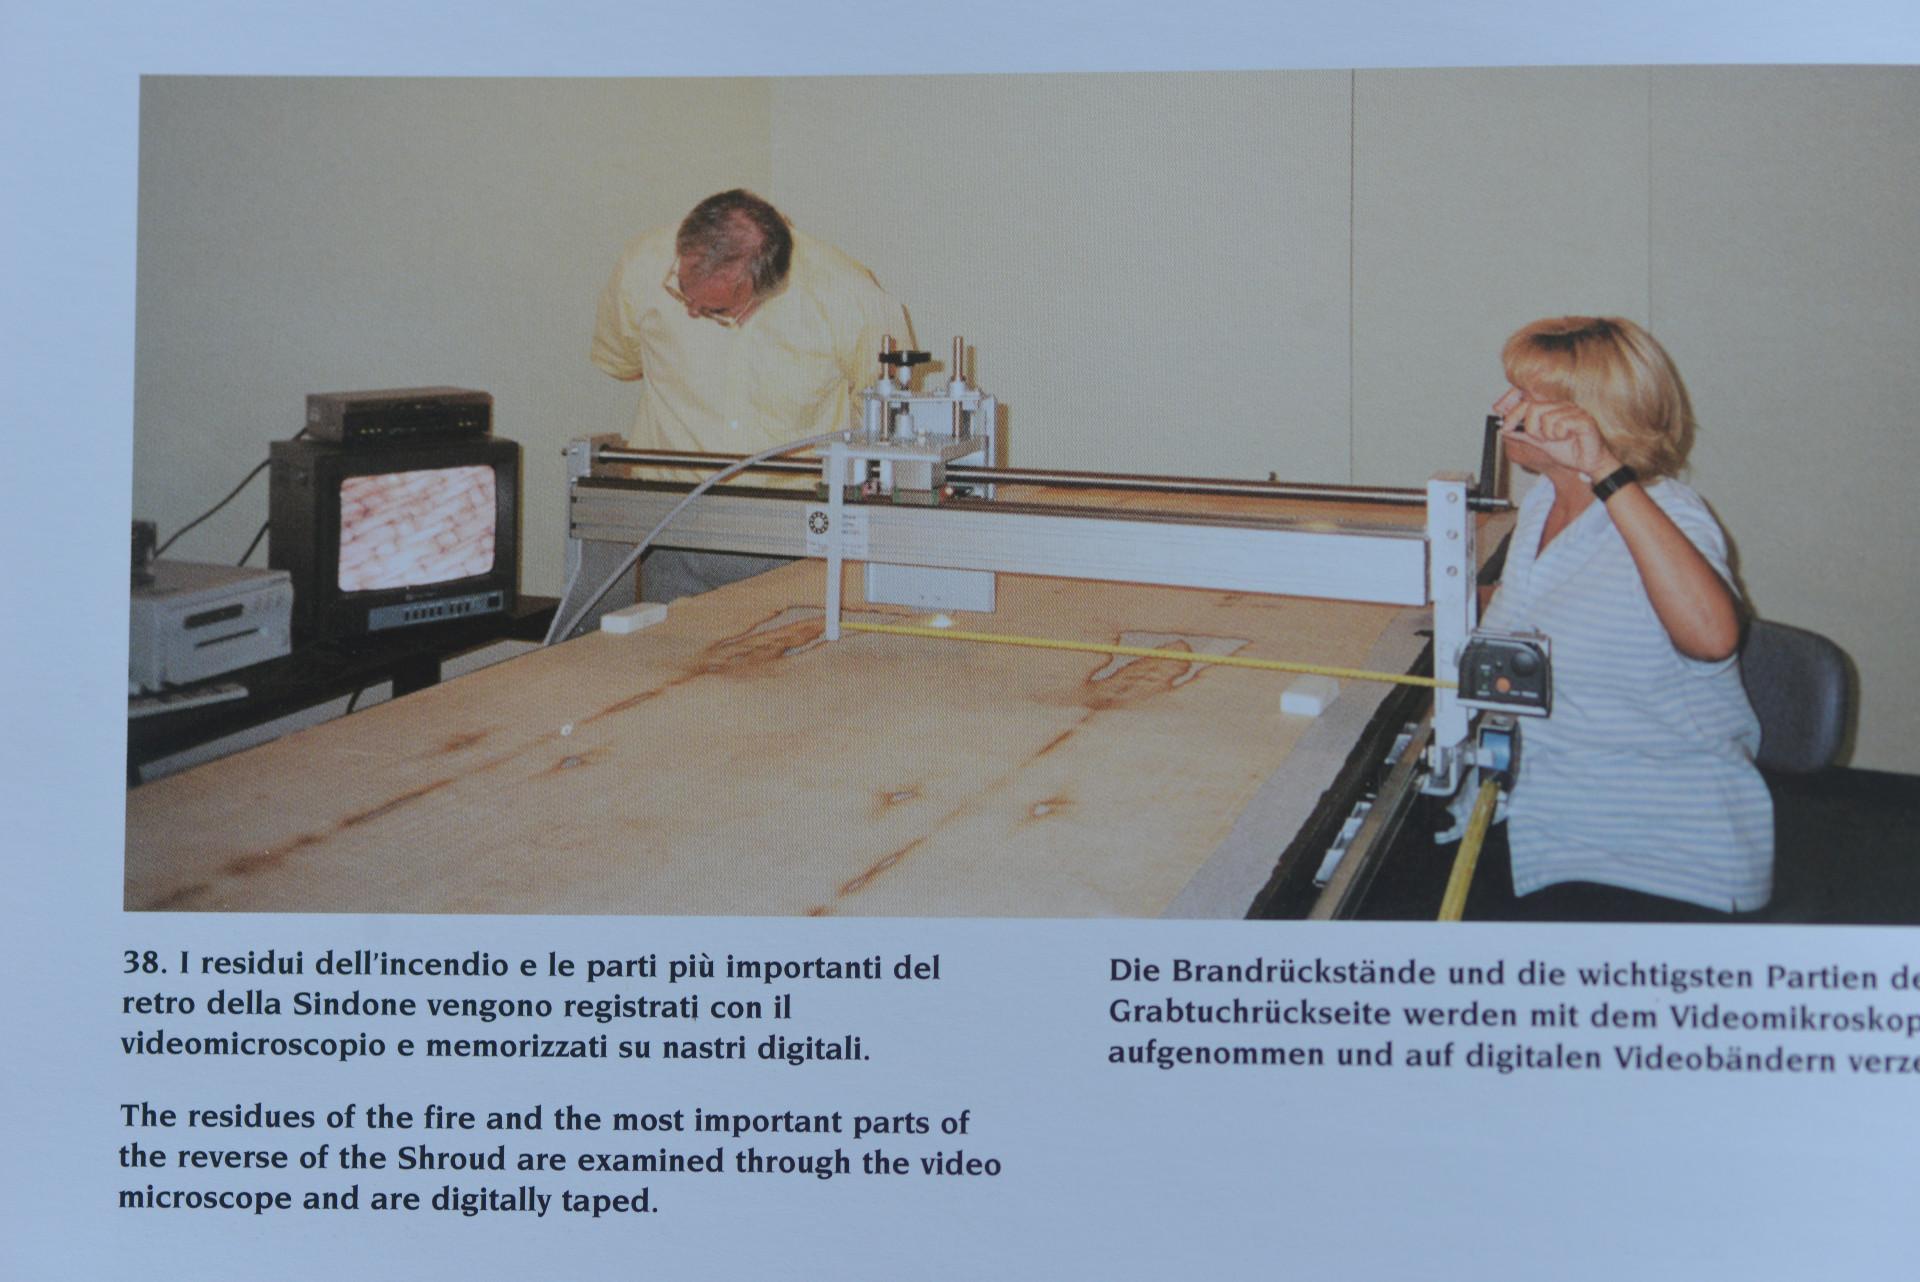 Photo E. Mechtild Flury-Lemberg microscopic control restauration Shroud